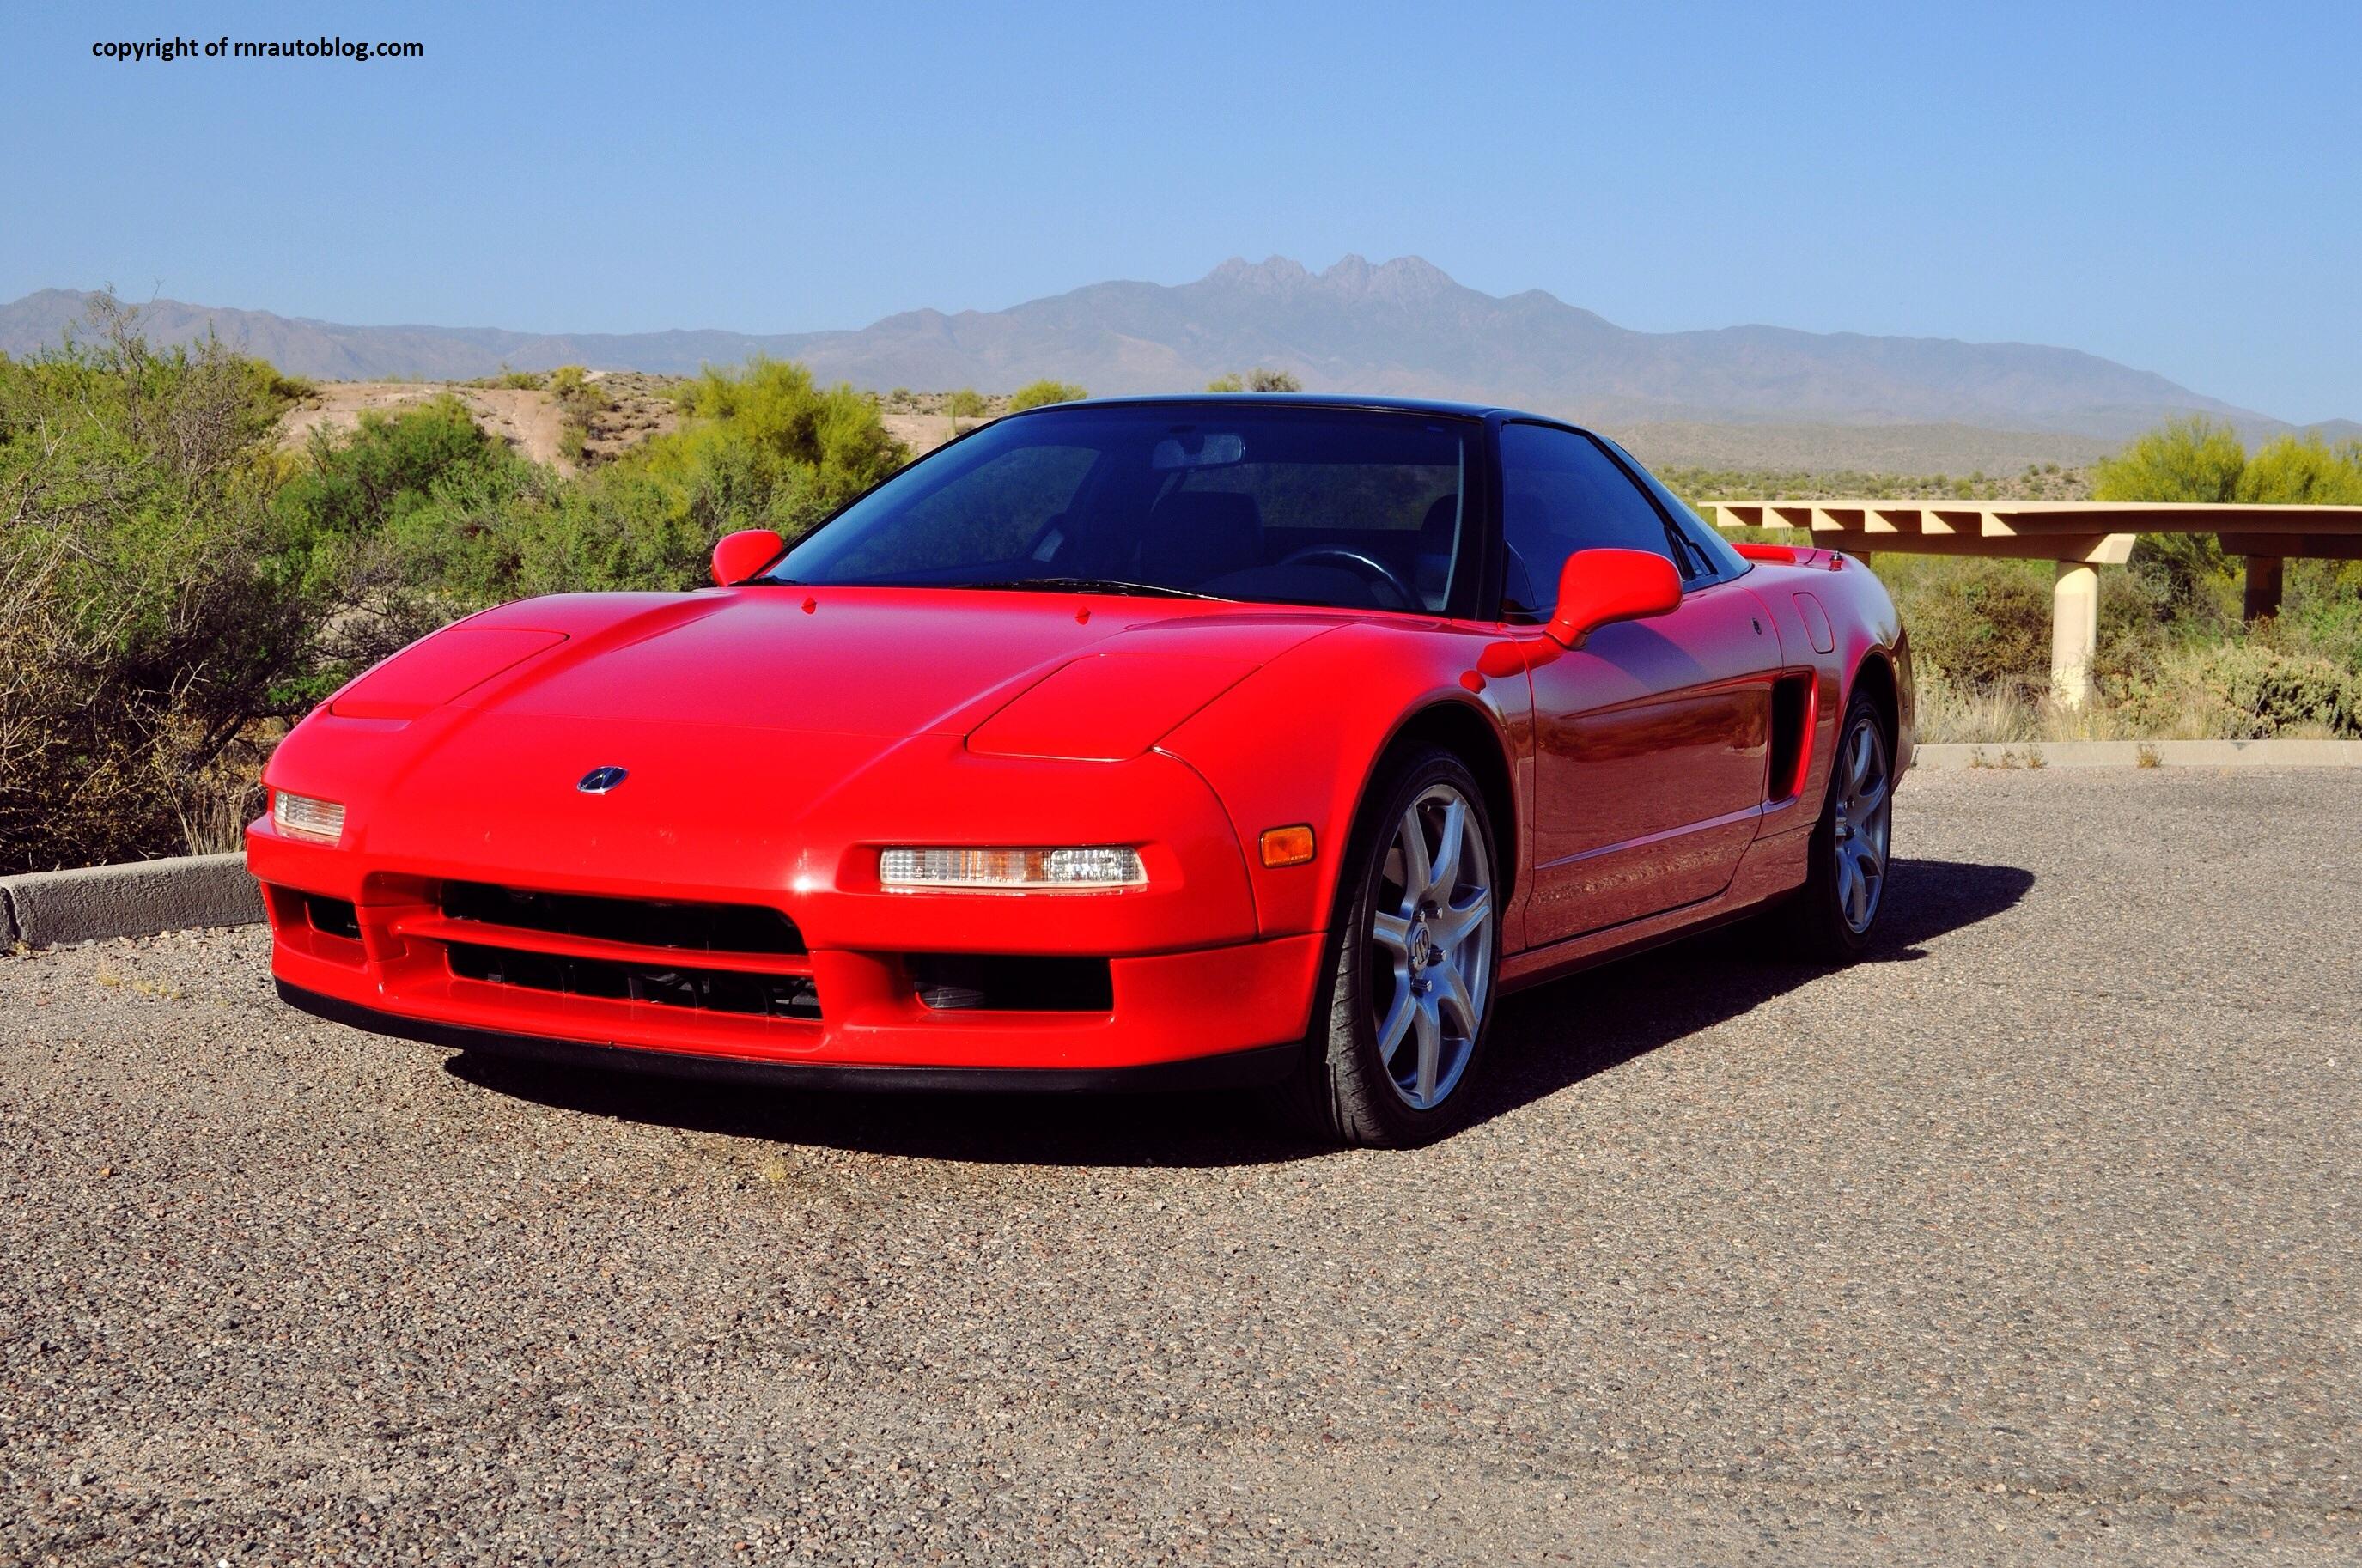 1992 Acura Nsx Review Rnr Automotive Blog